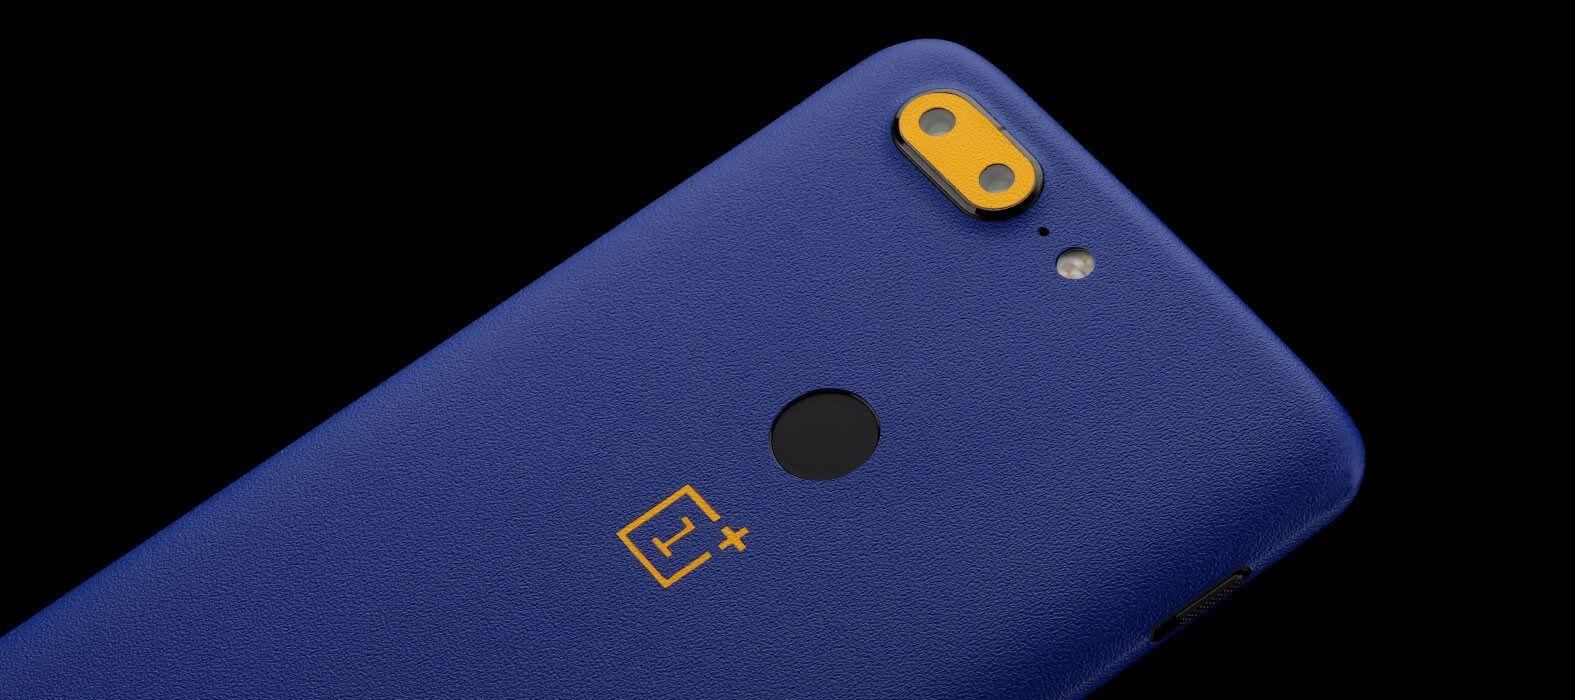 OnePlus 5T Skins, Decals, Wraps - Sandstone blue